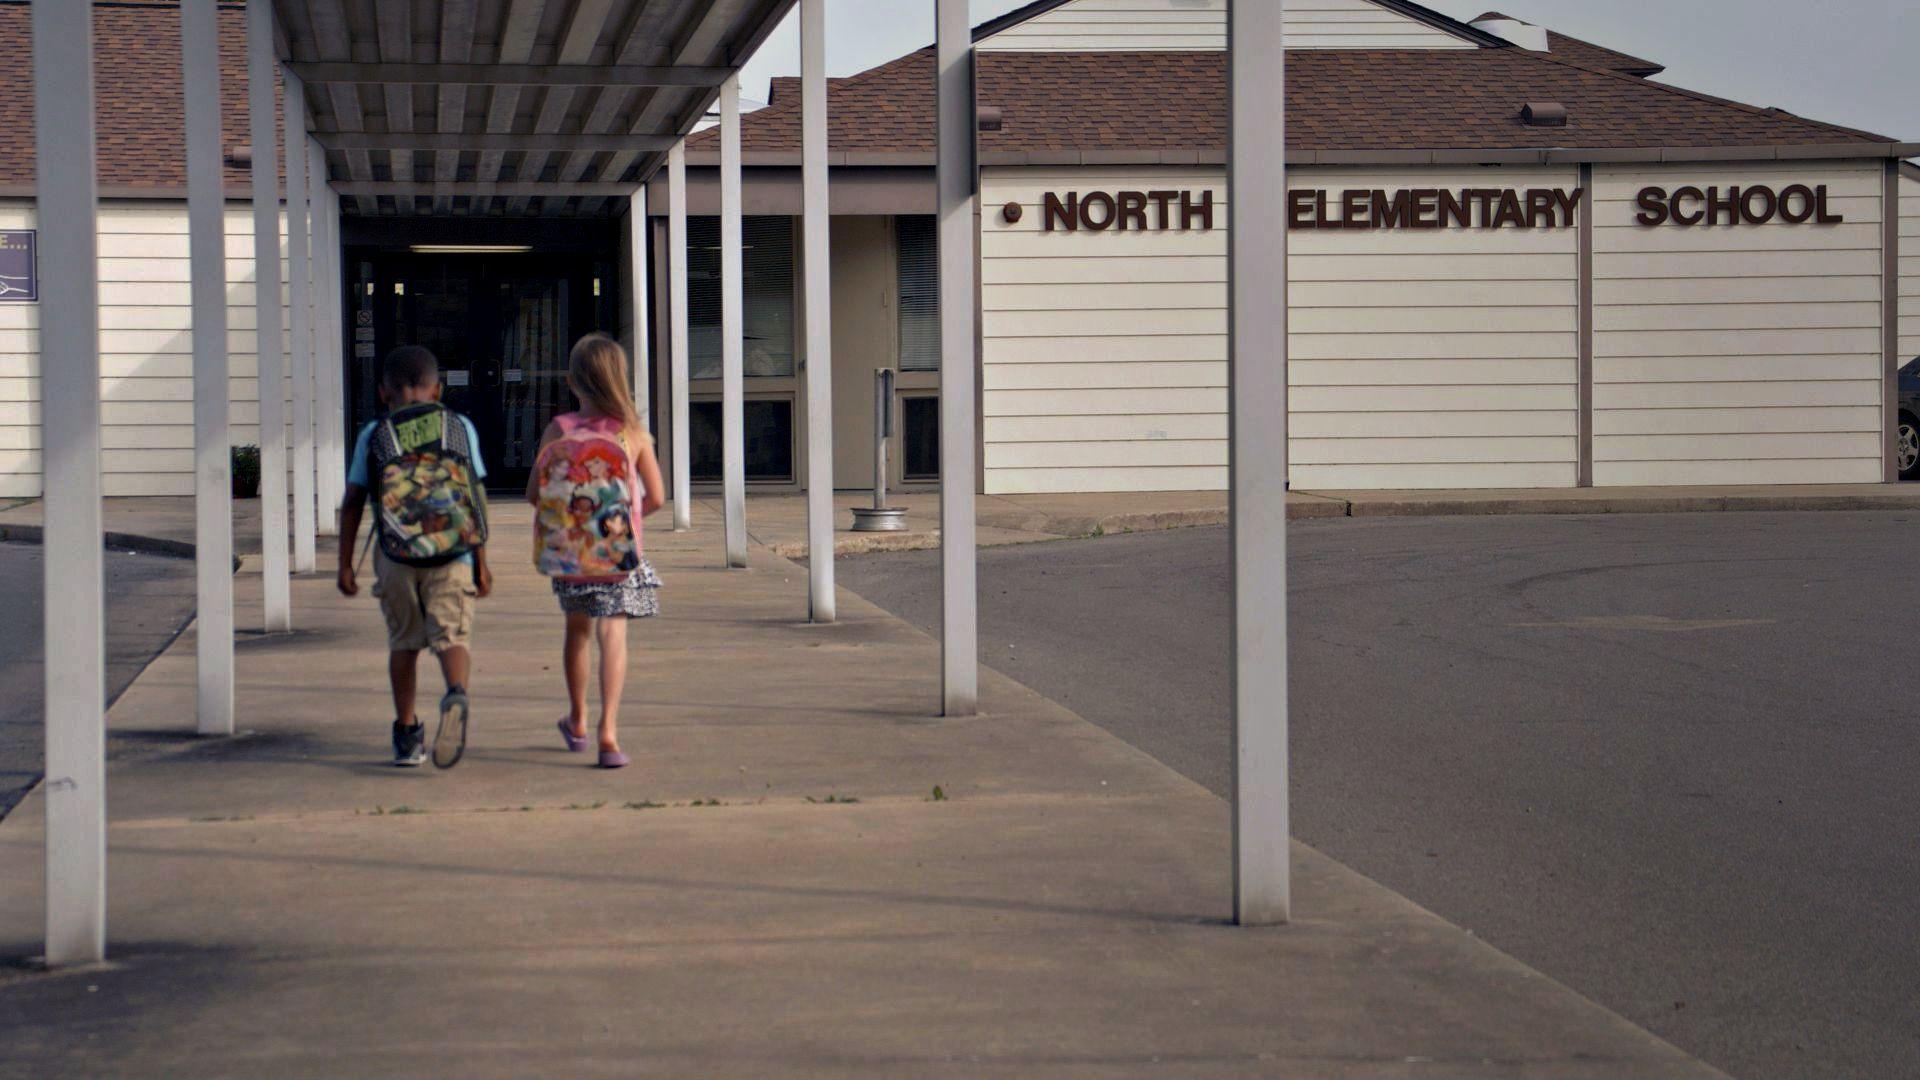 North Elementary School2.jpg